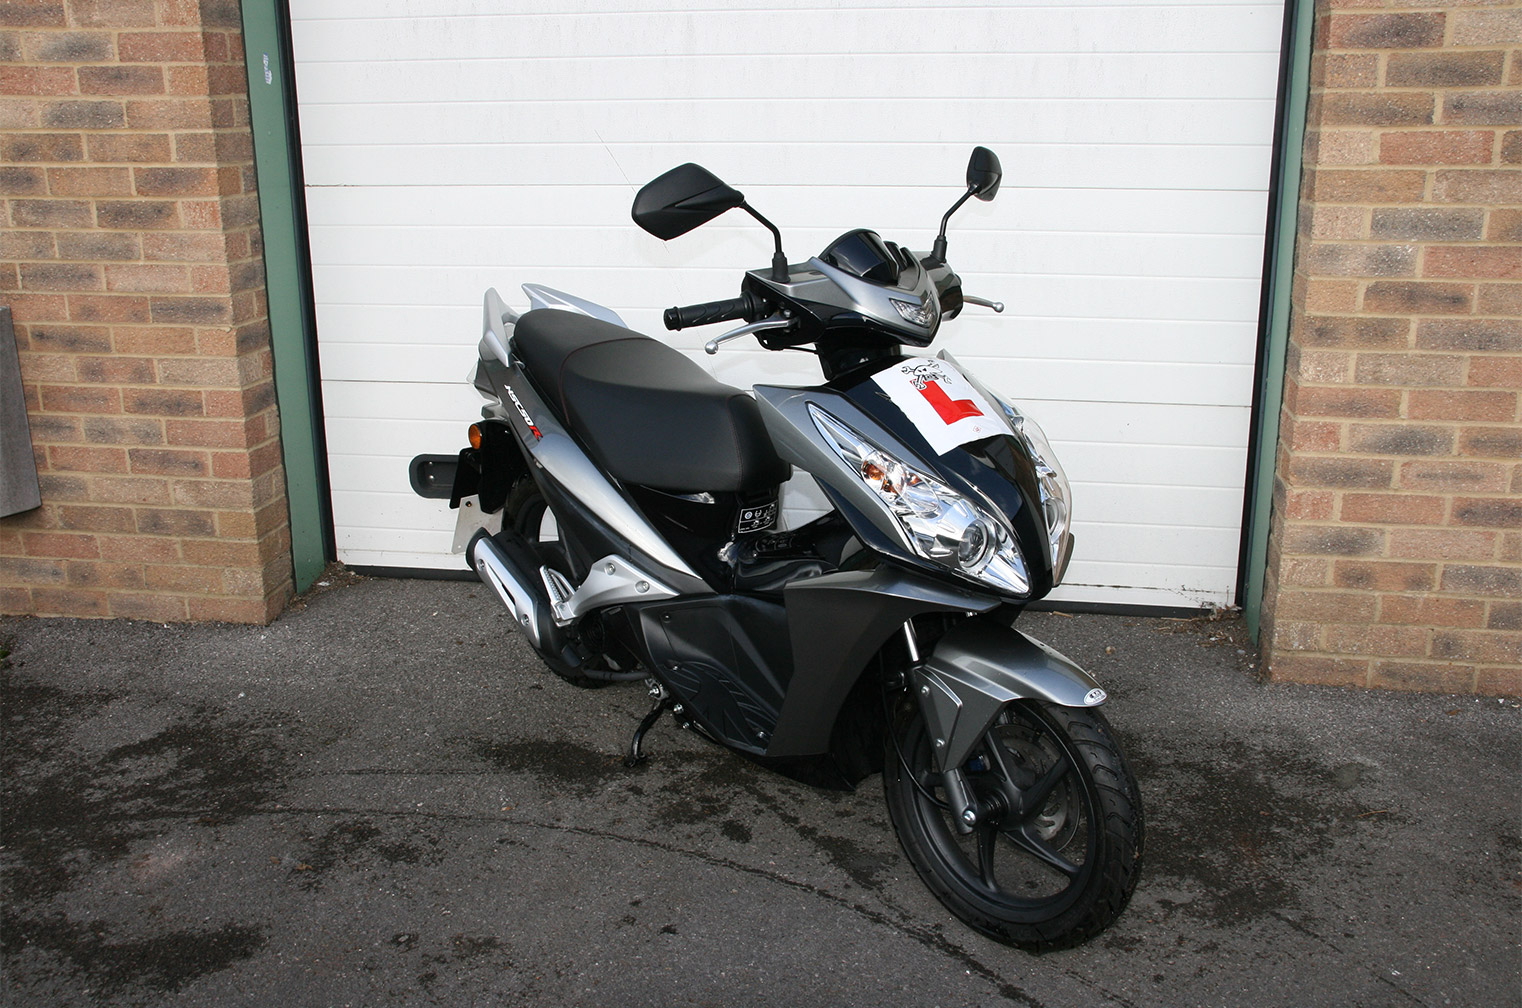 https://www.sjsmotorcycles.co.uk/wp-content/uploads/2017/03/Honda-NSC-5.jpg